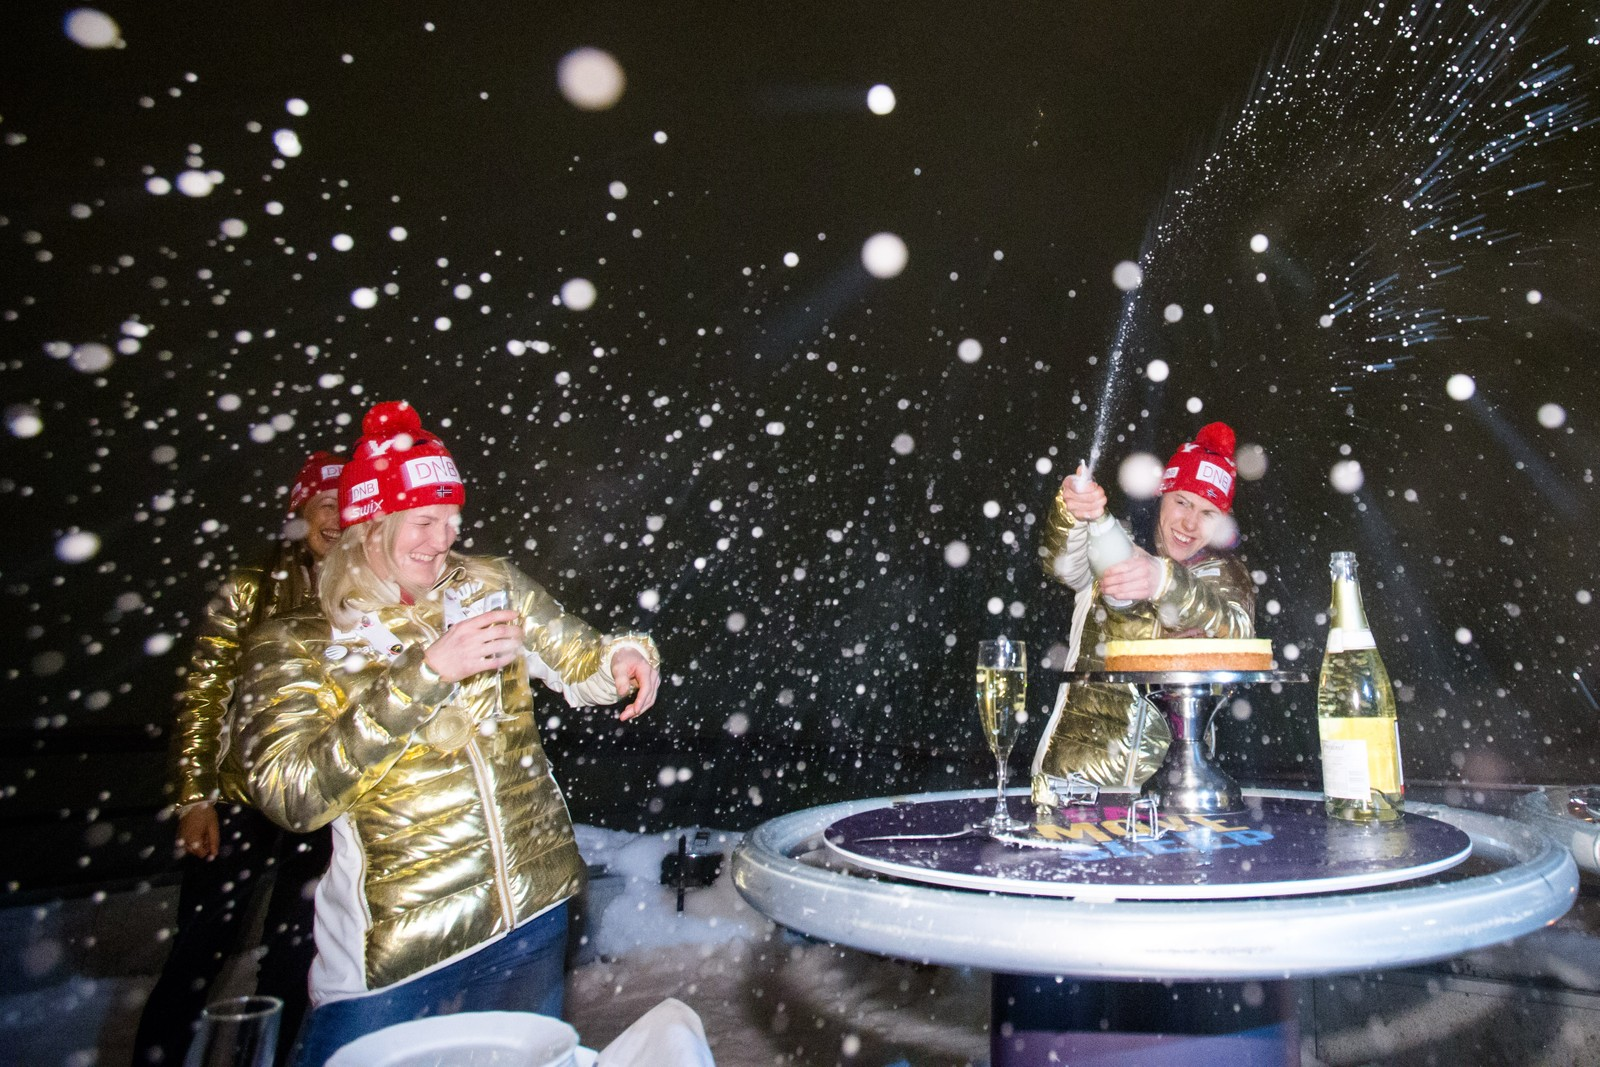 Marte Olsbu (t.v.) og Synnøve Solemdal under markeringen av Norges gull på stafetten i VM i skiskyting i Holmenkollen fredag kveld.